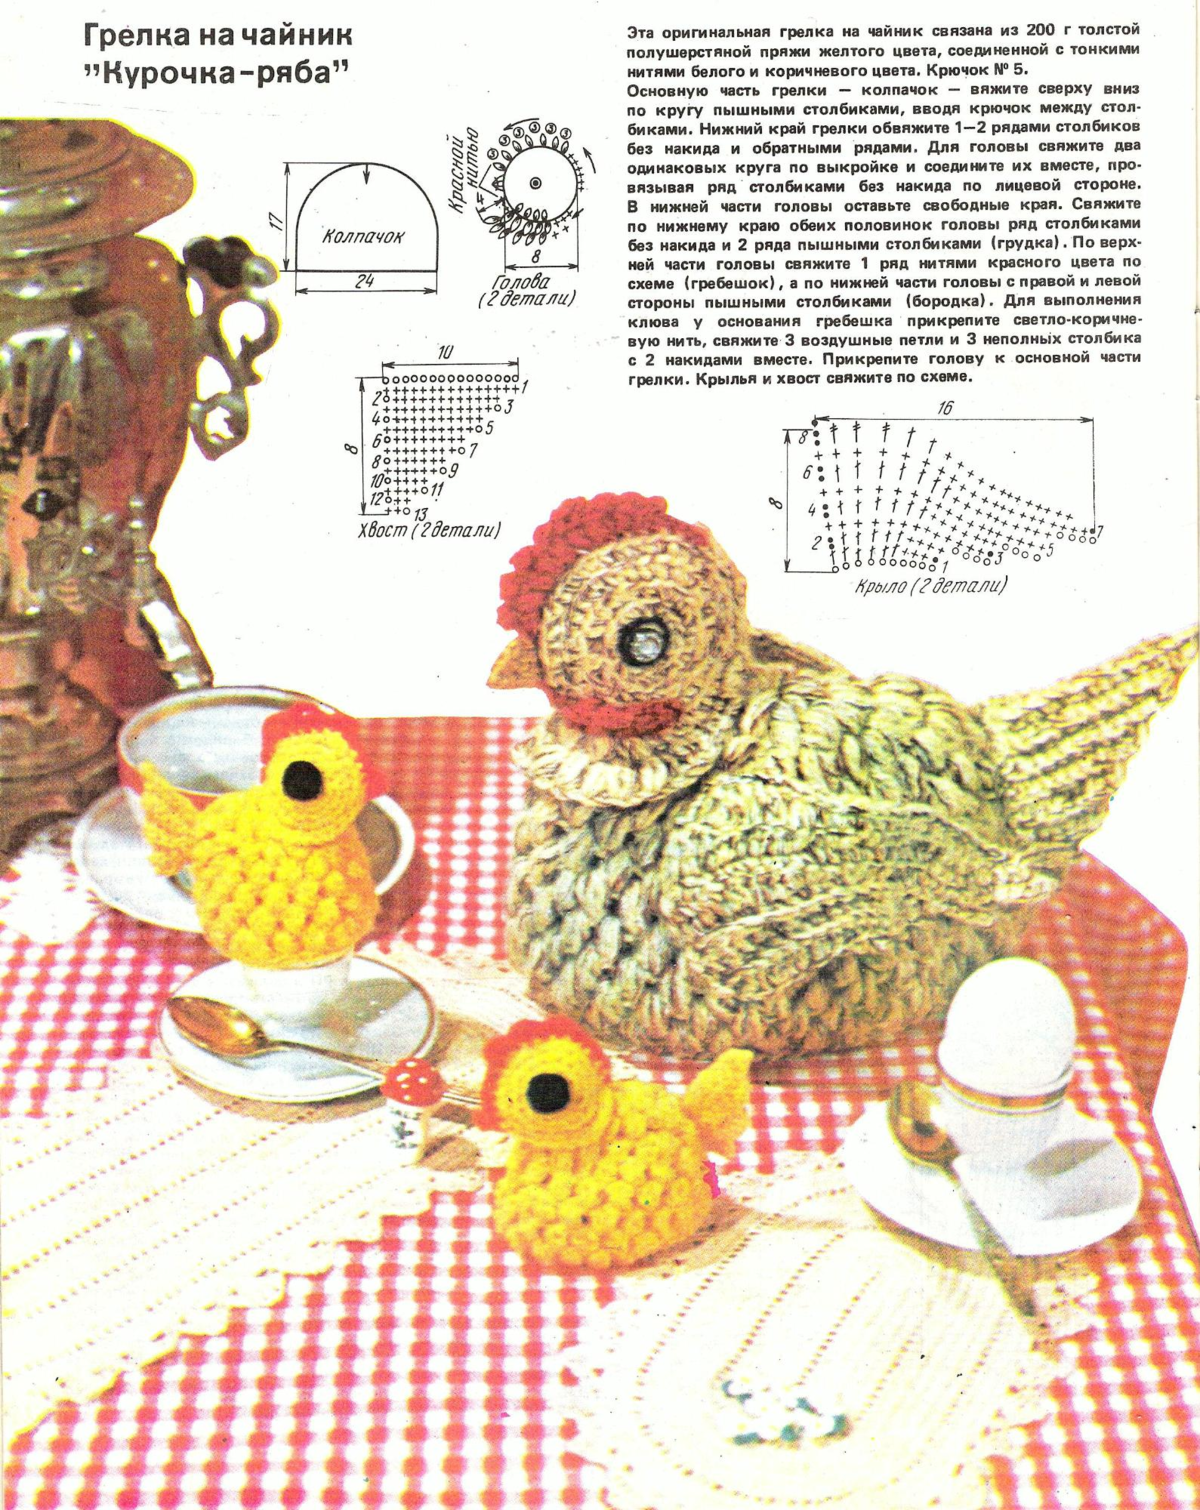 Грелка на чайник крючком курочка схема и описание фото